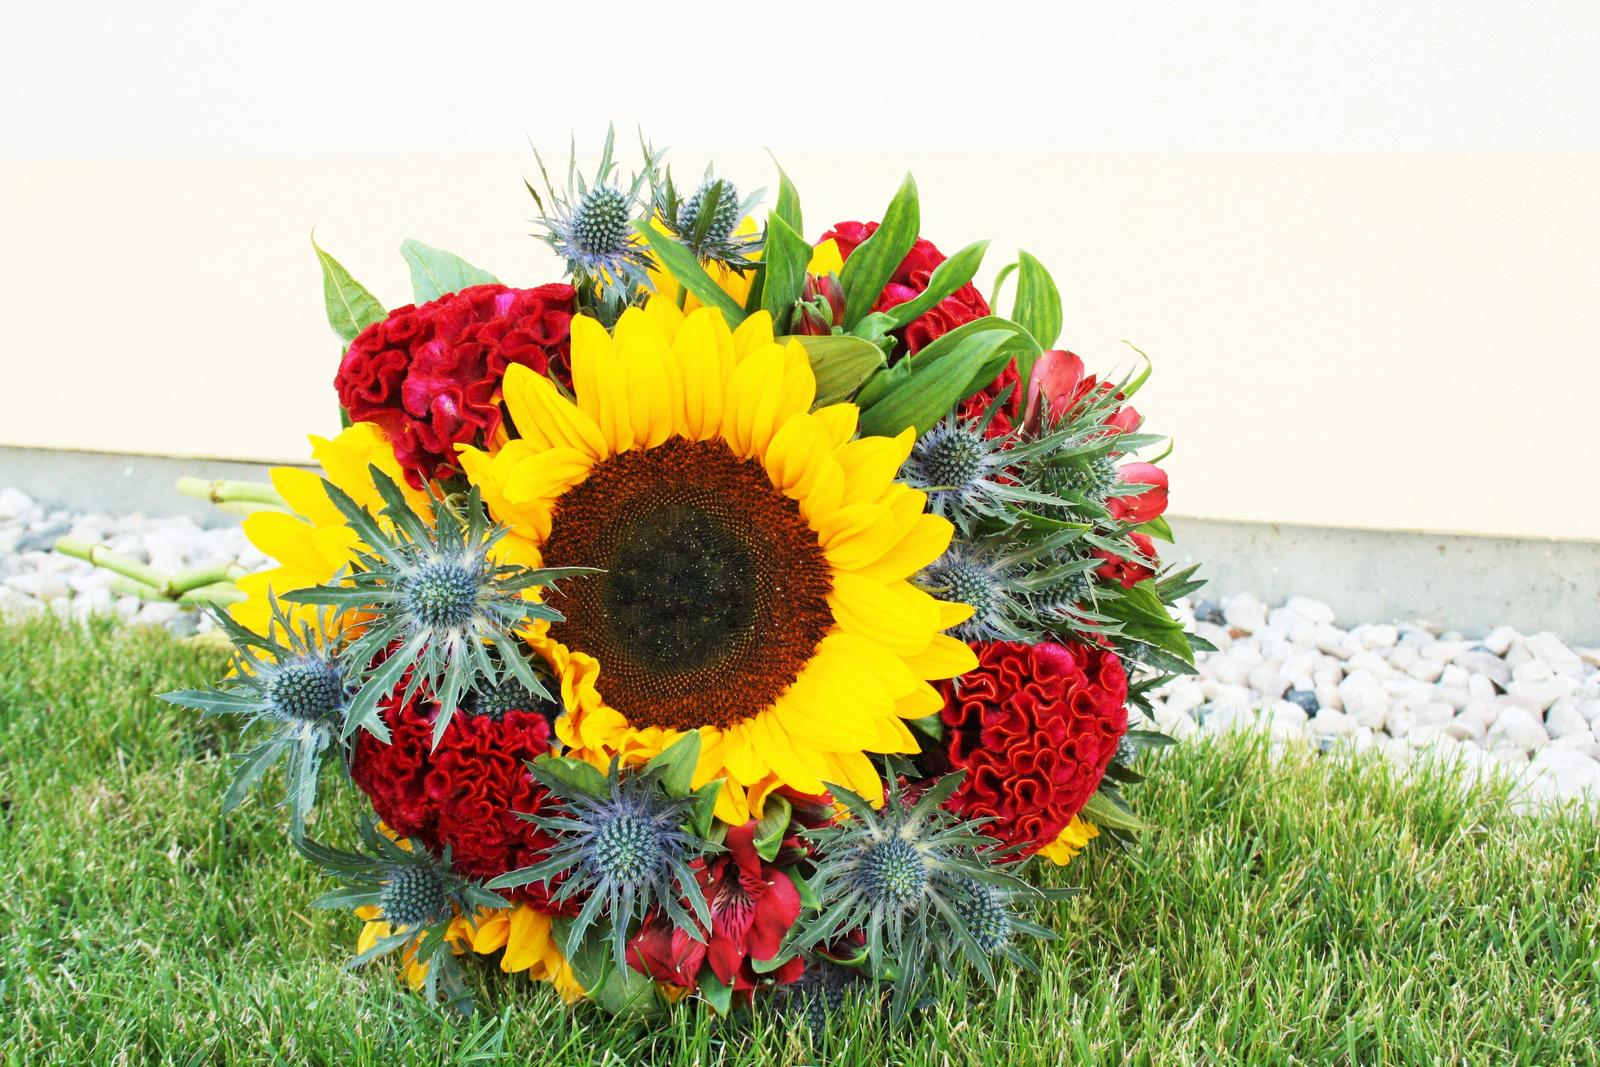 Jarne a letne aranzmany a dekoracie - Kedze je sezona slnecnic, jedna slnecnicova...